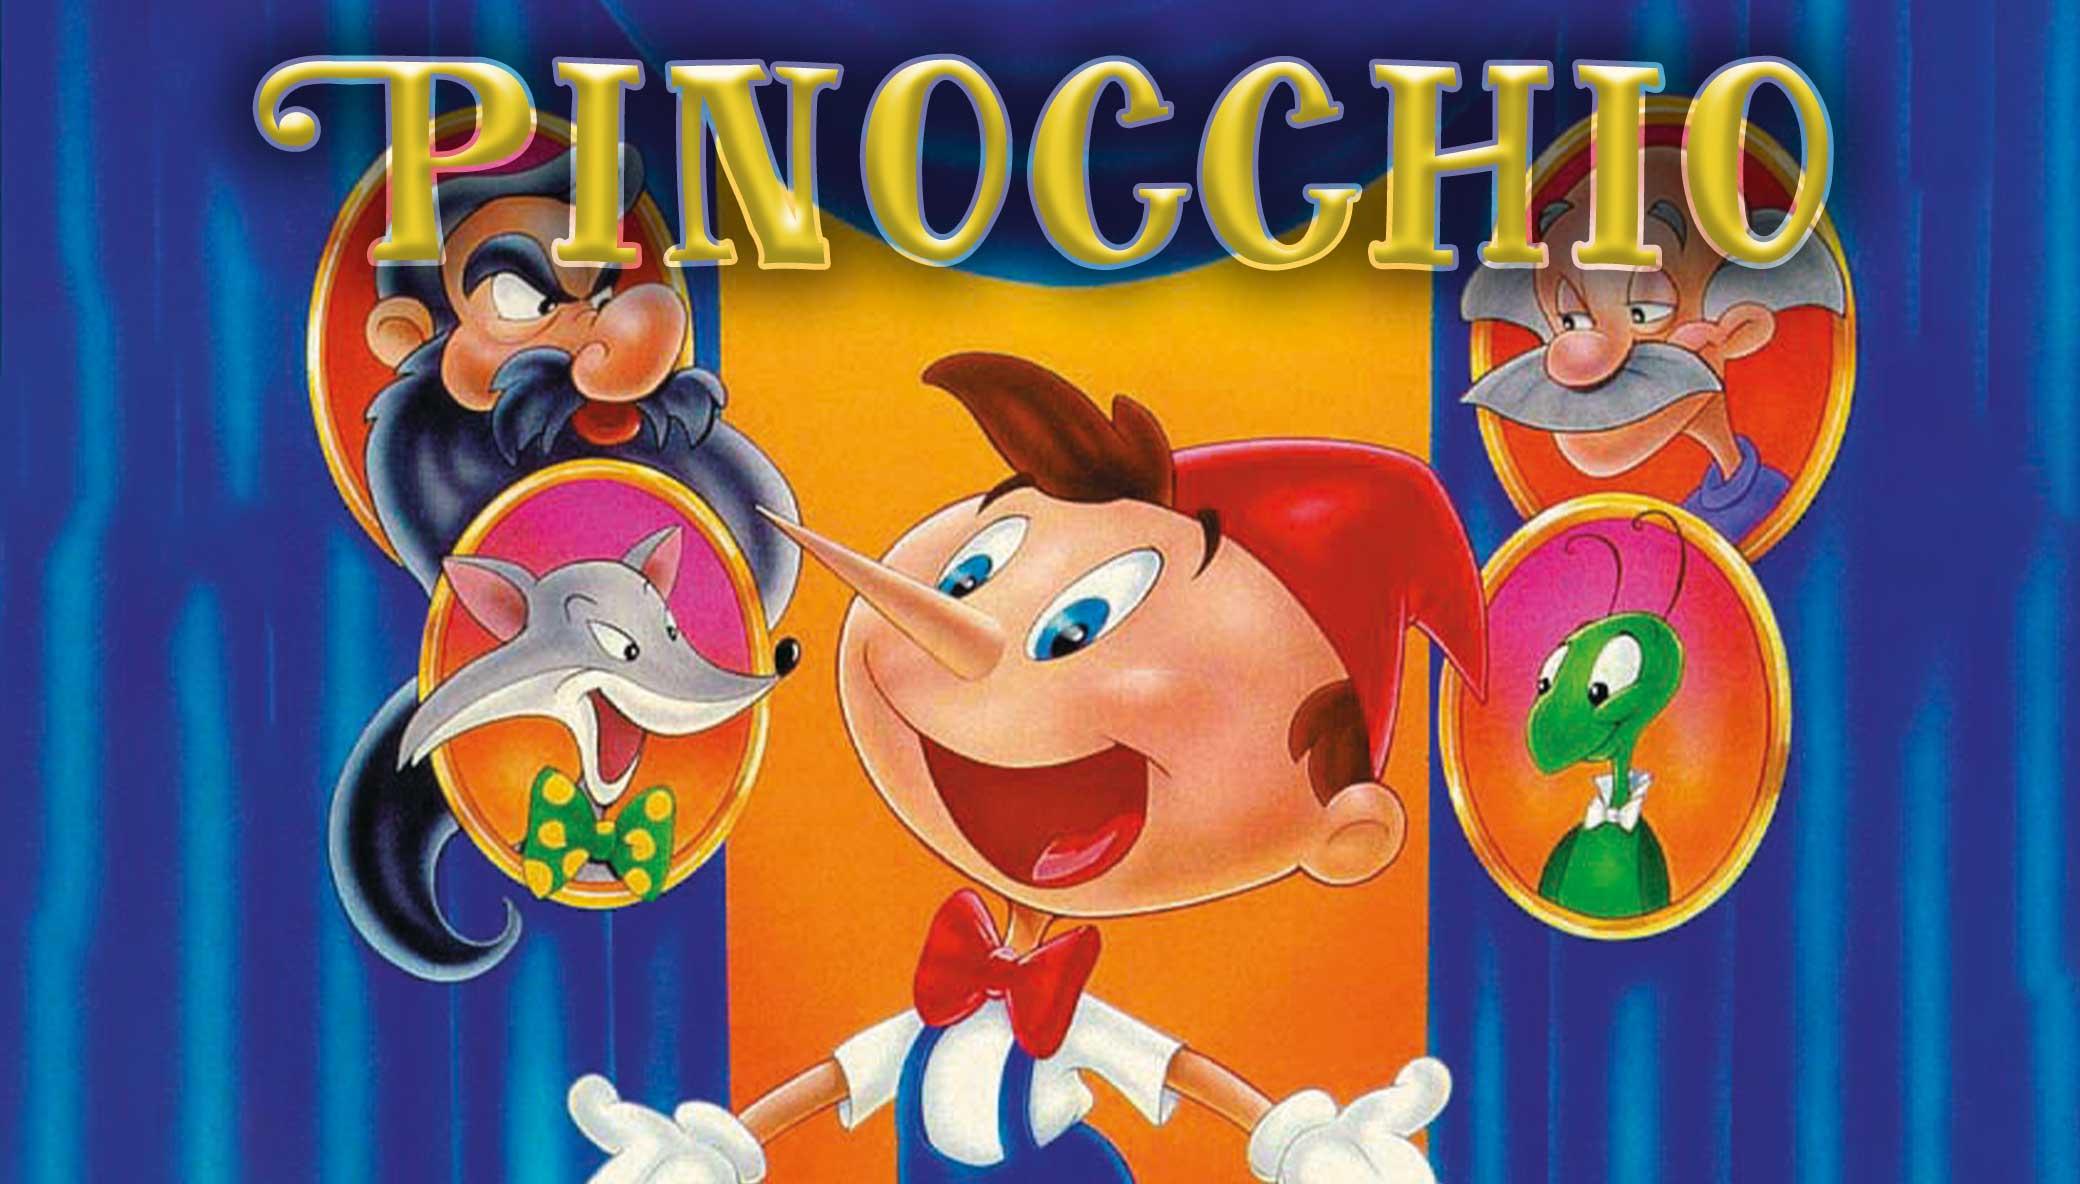 pinocchio\header.jpg